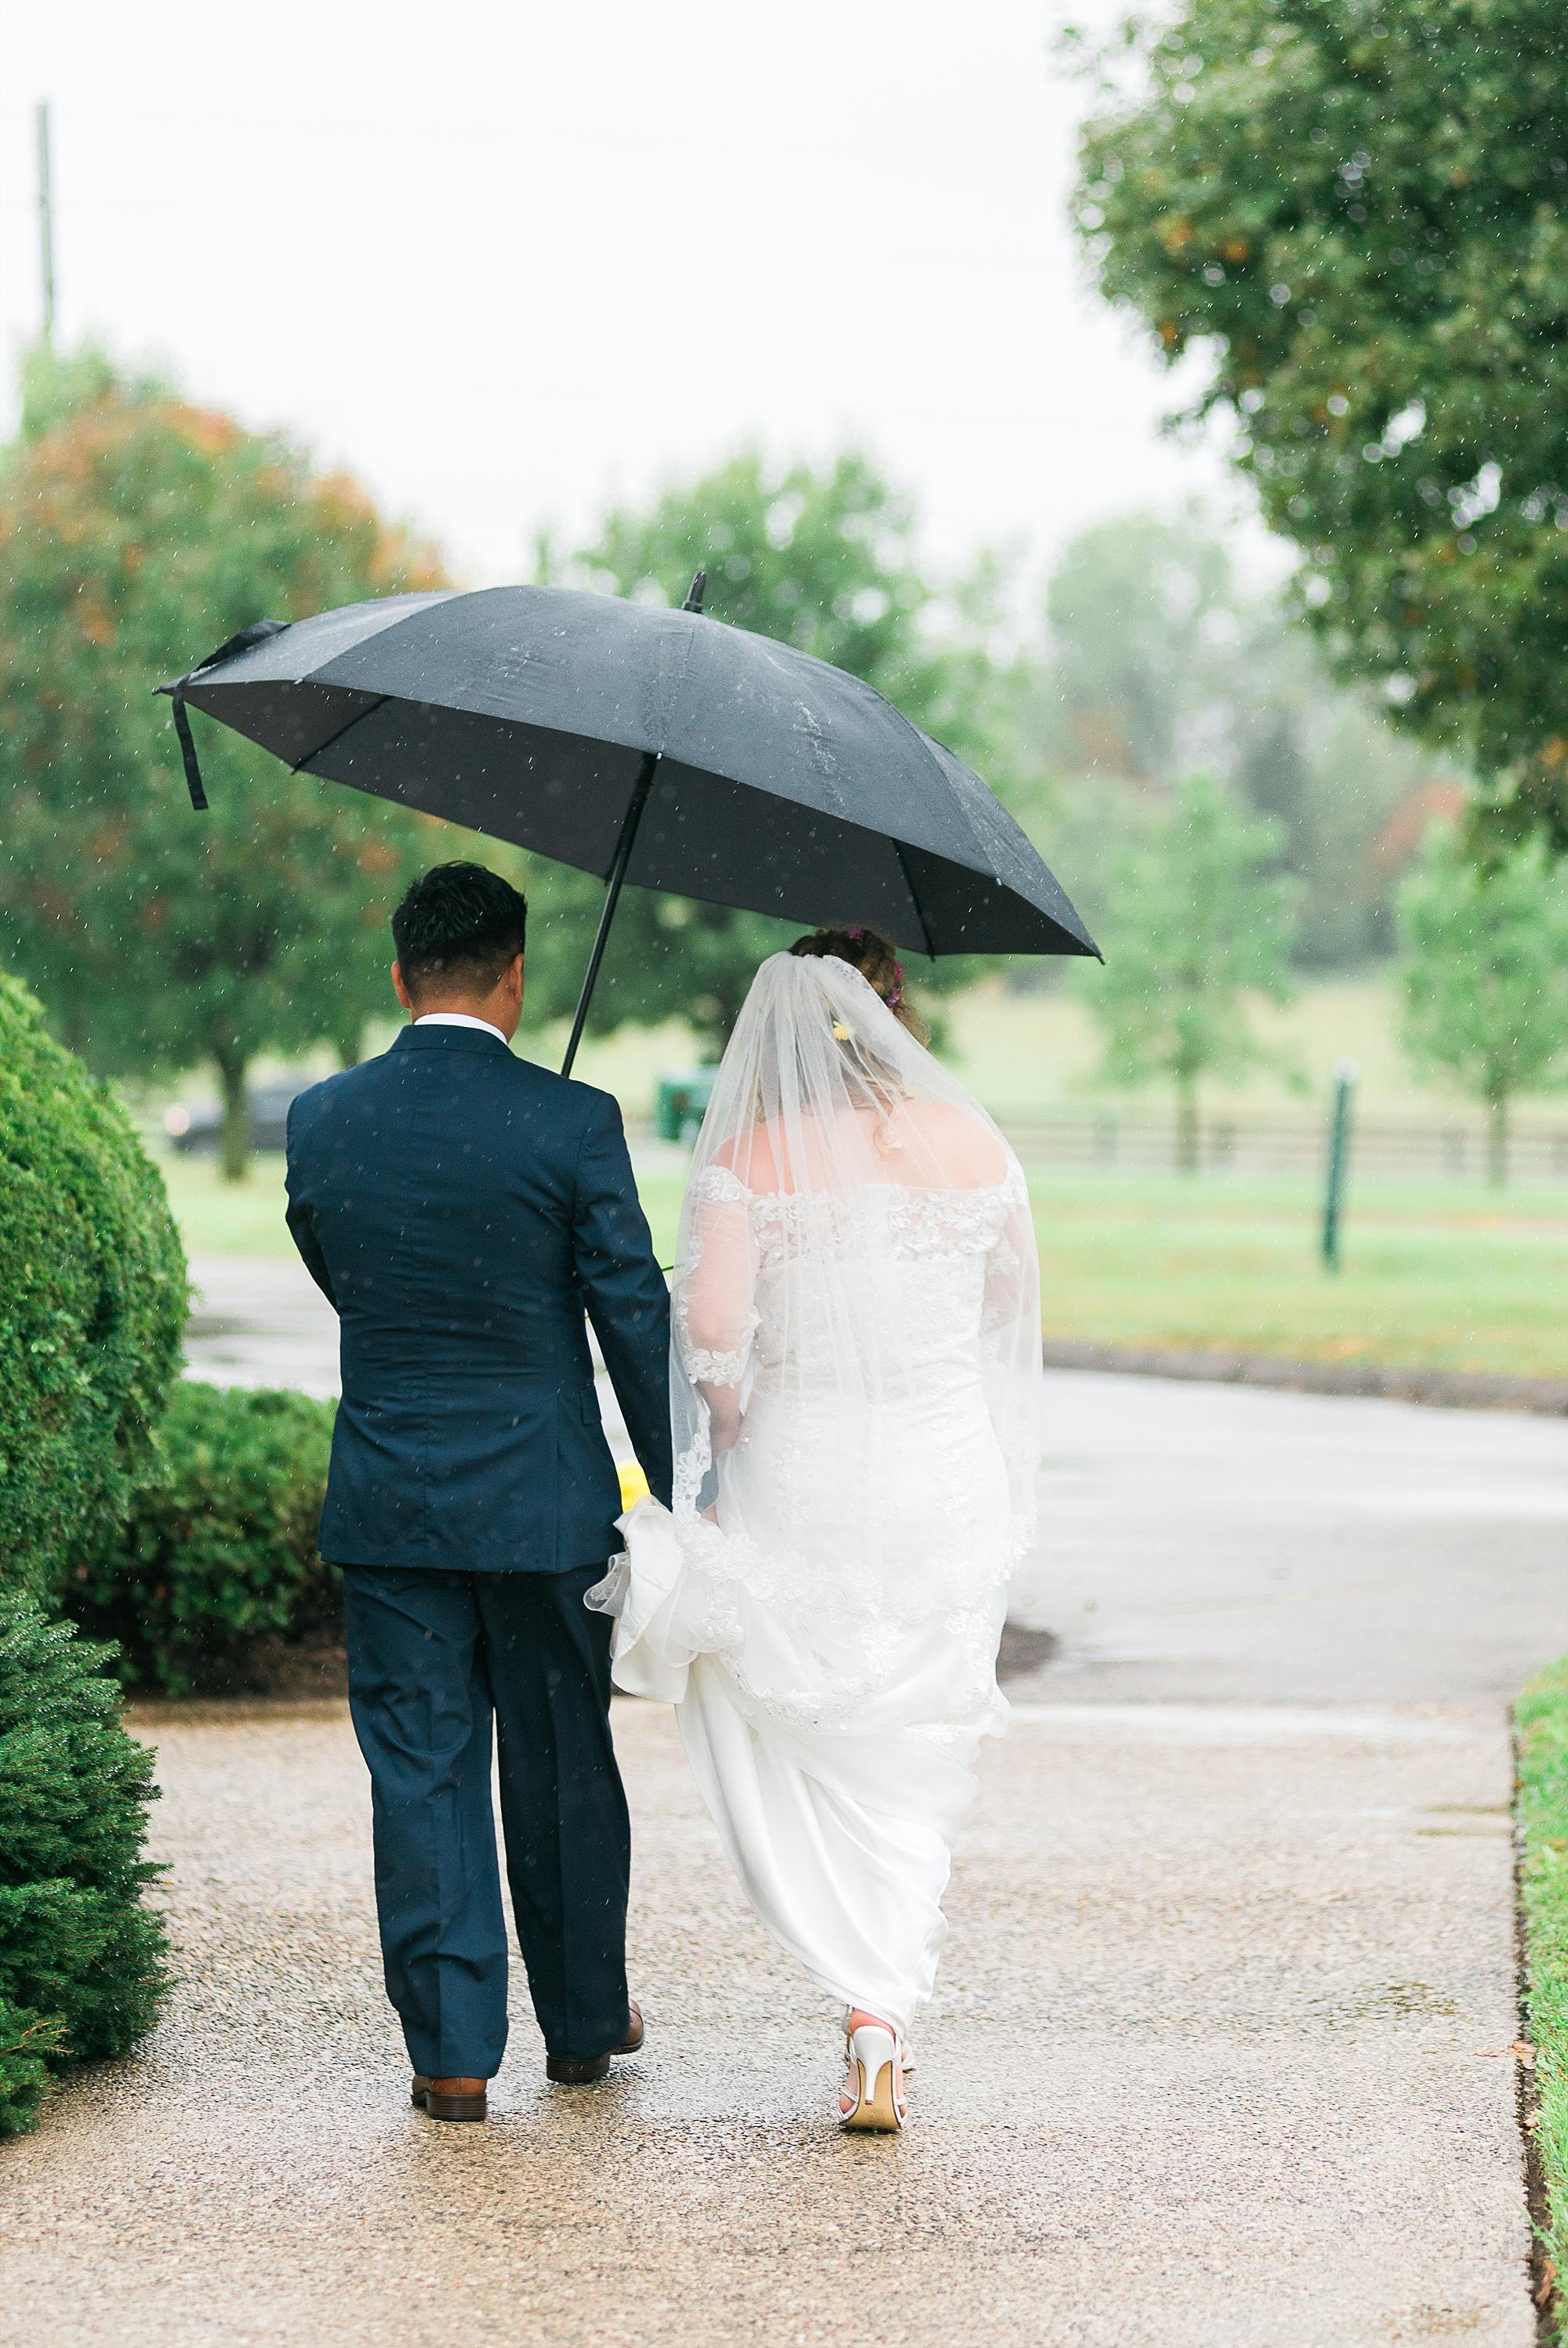 rainy-day-wedding-umbrella